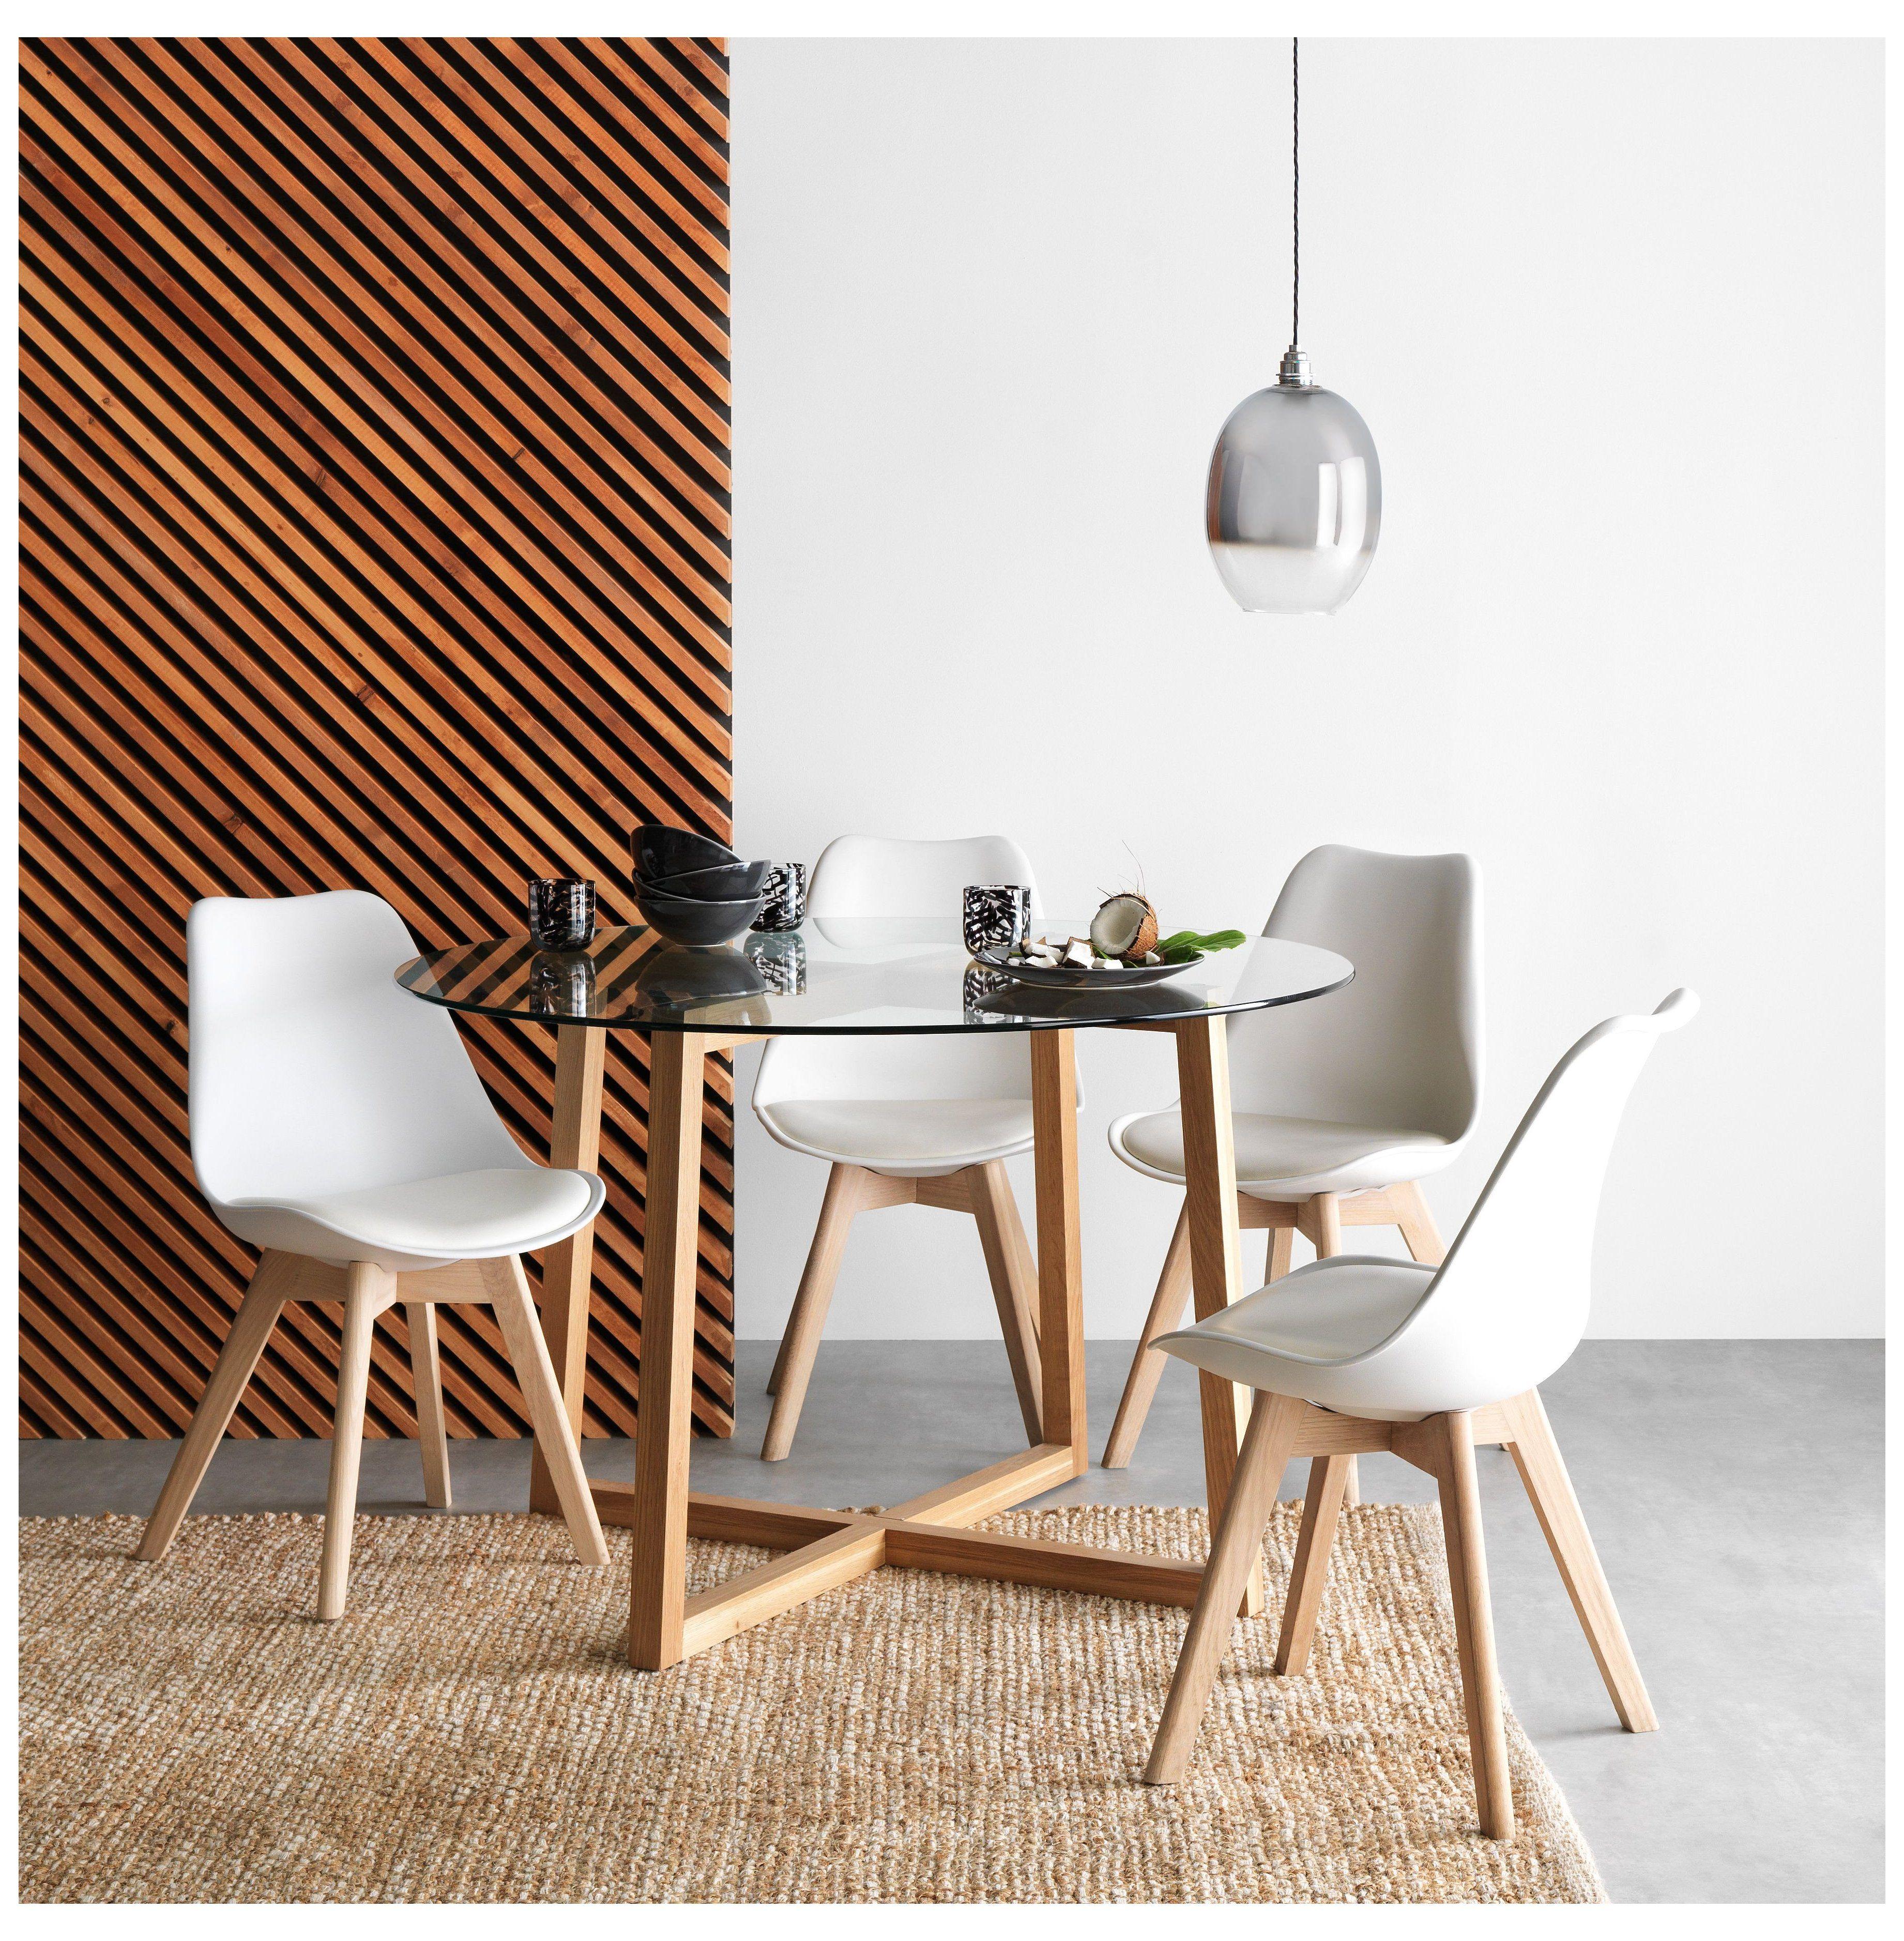 Download Wallpaper White Kitchen Table Dublin